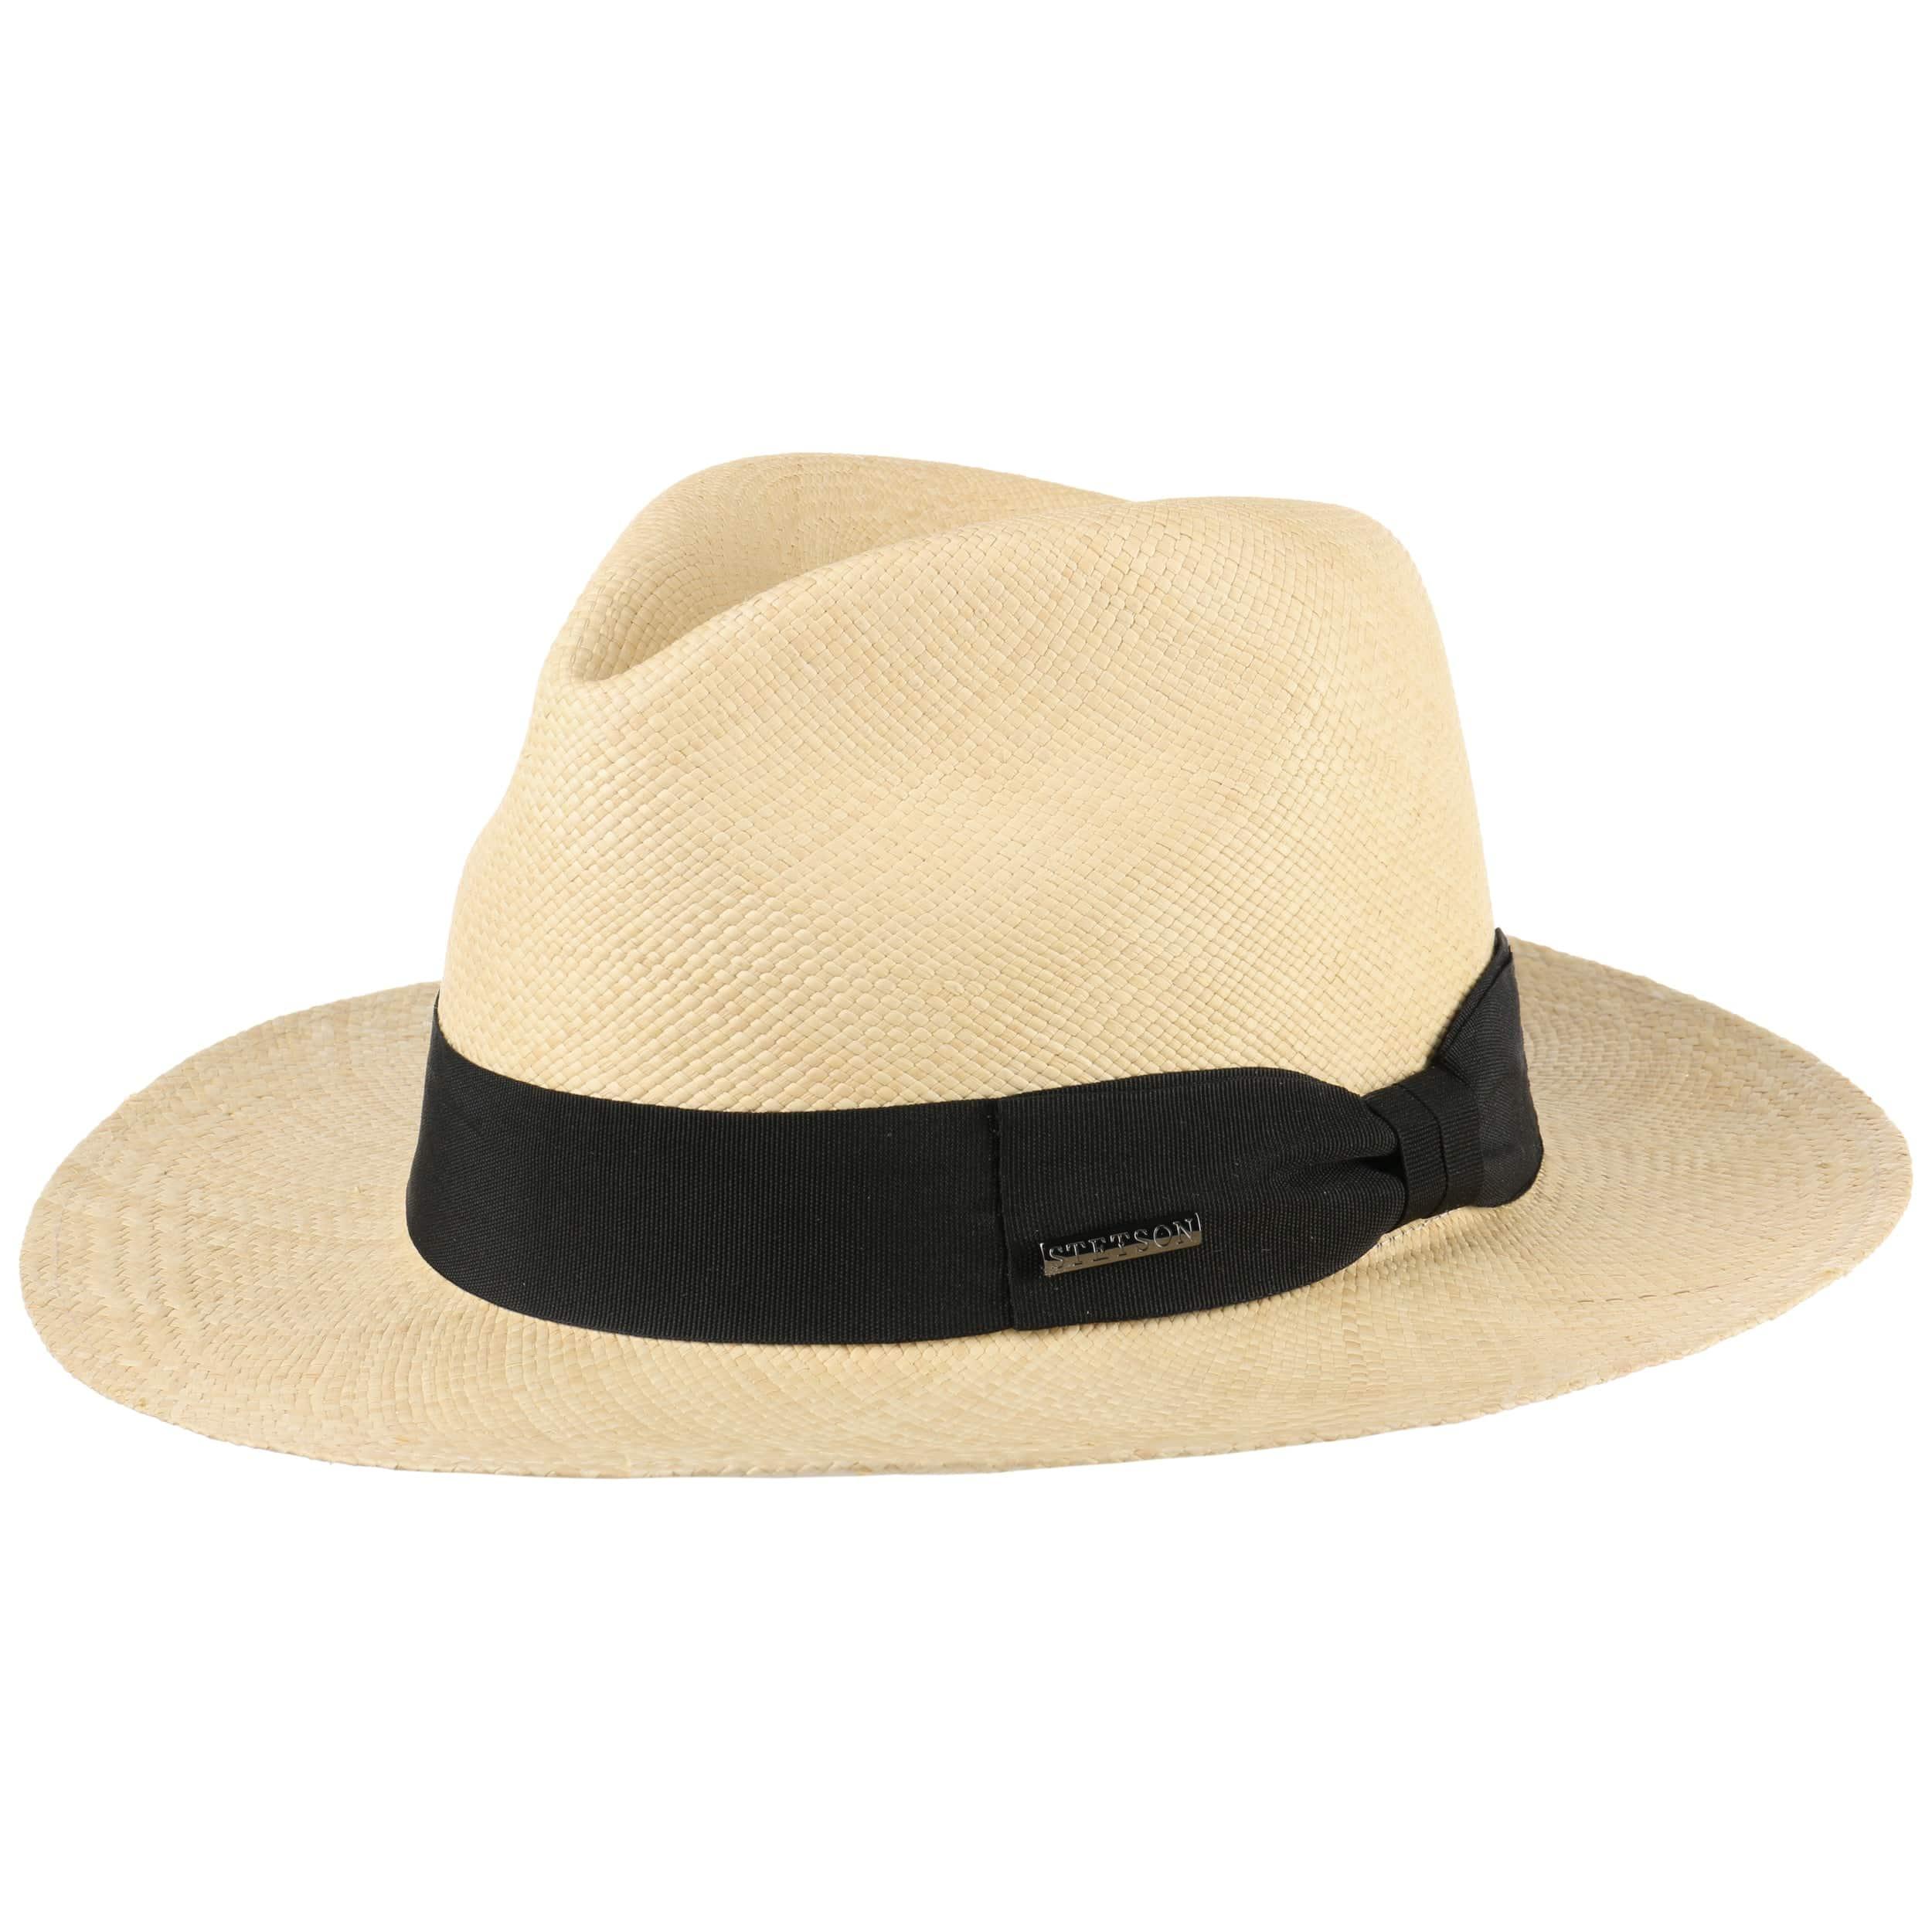 993ea719ccc2 ... Valmora Fedora Panama Hat by Stetson - nature 3